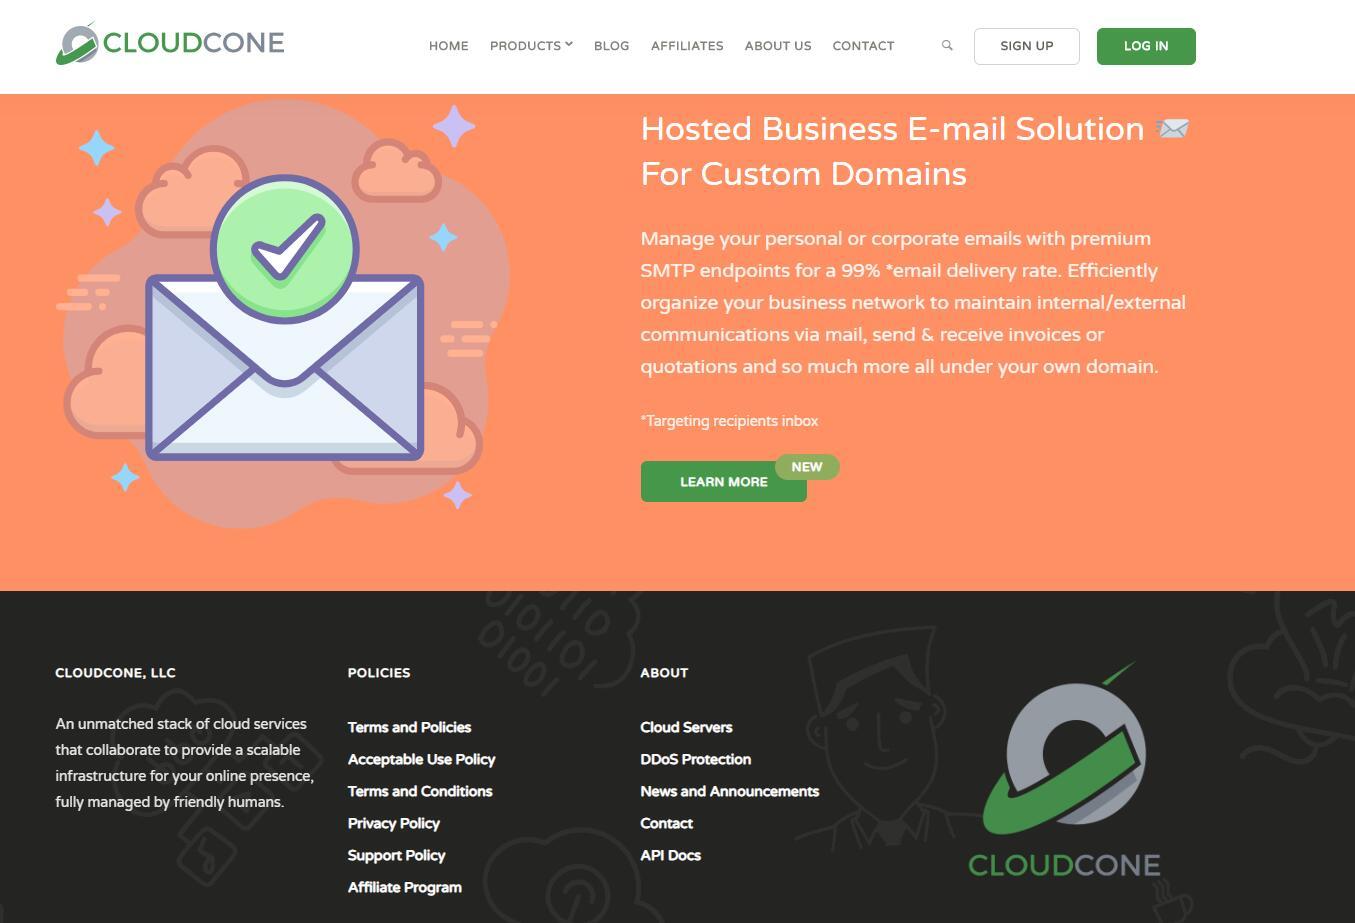 CloudCone推出CN2 GIA 美国VPS - 低至3美元/月